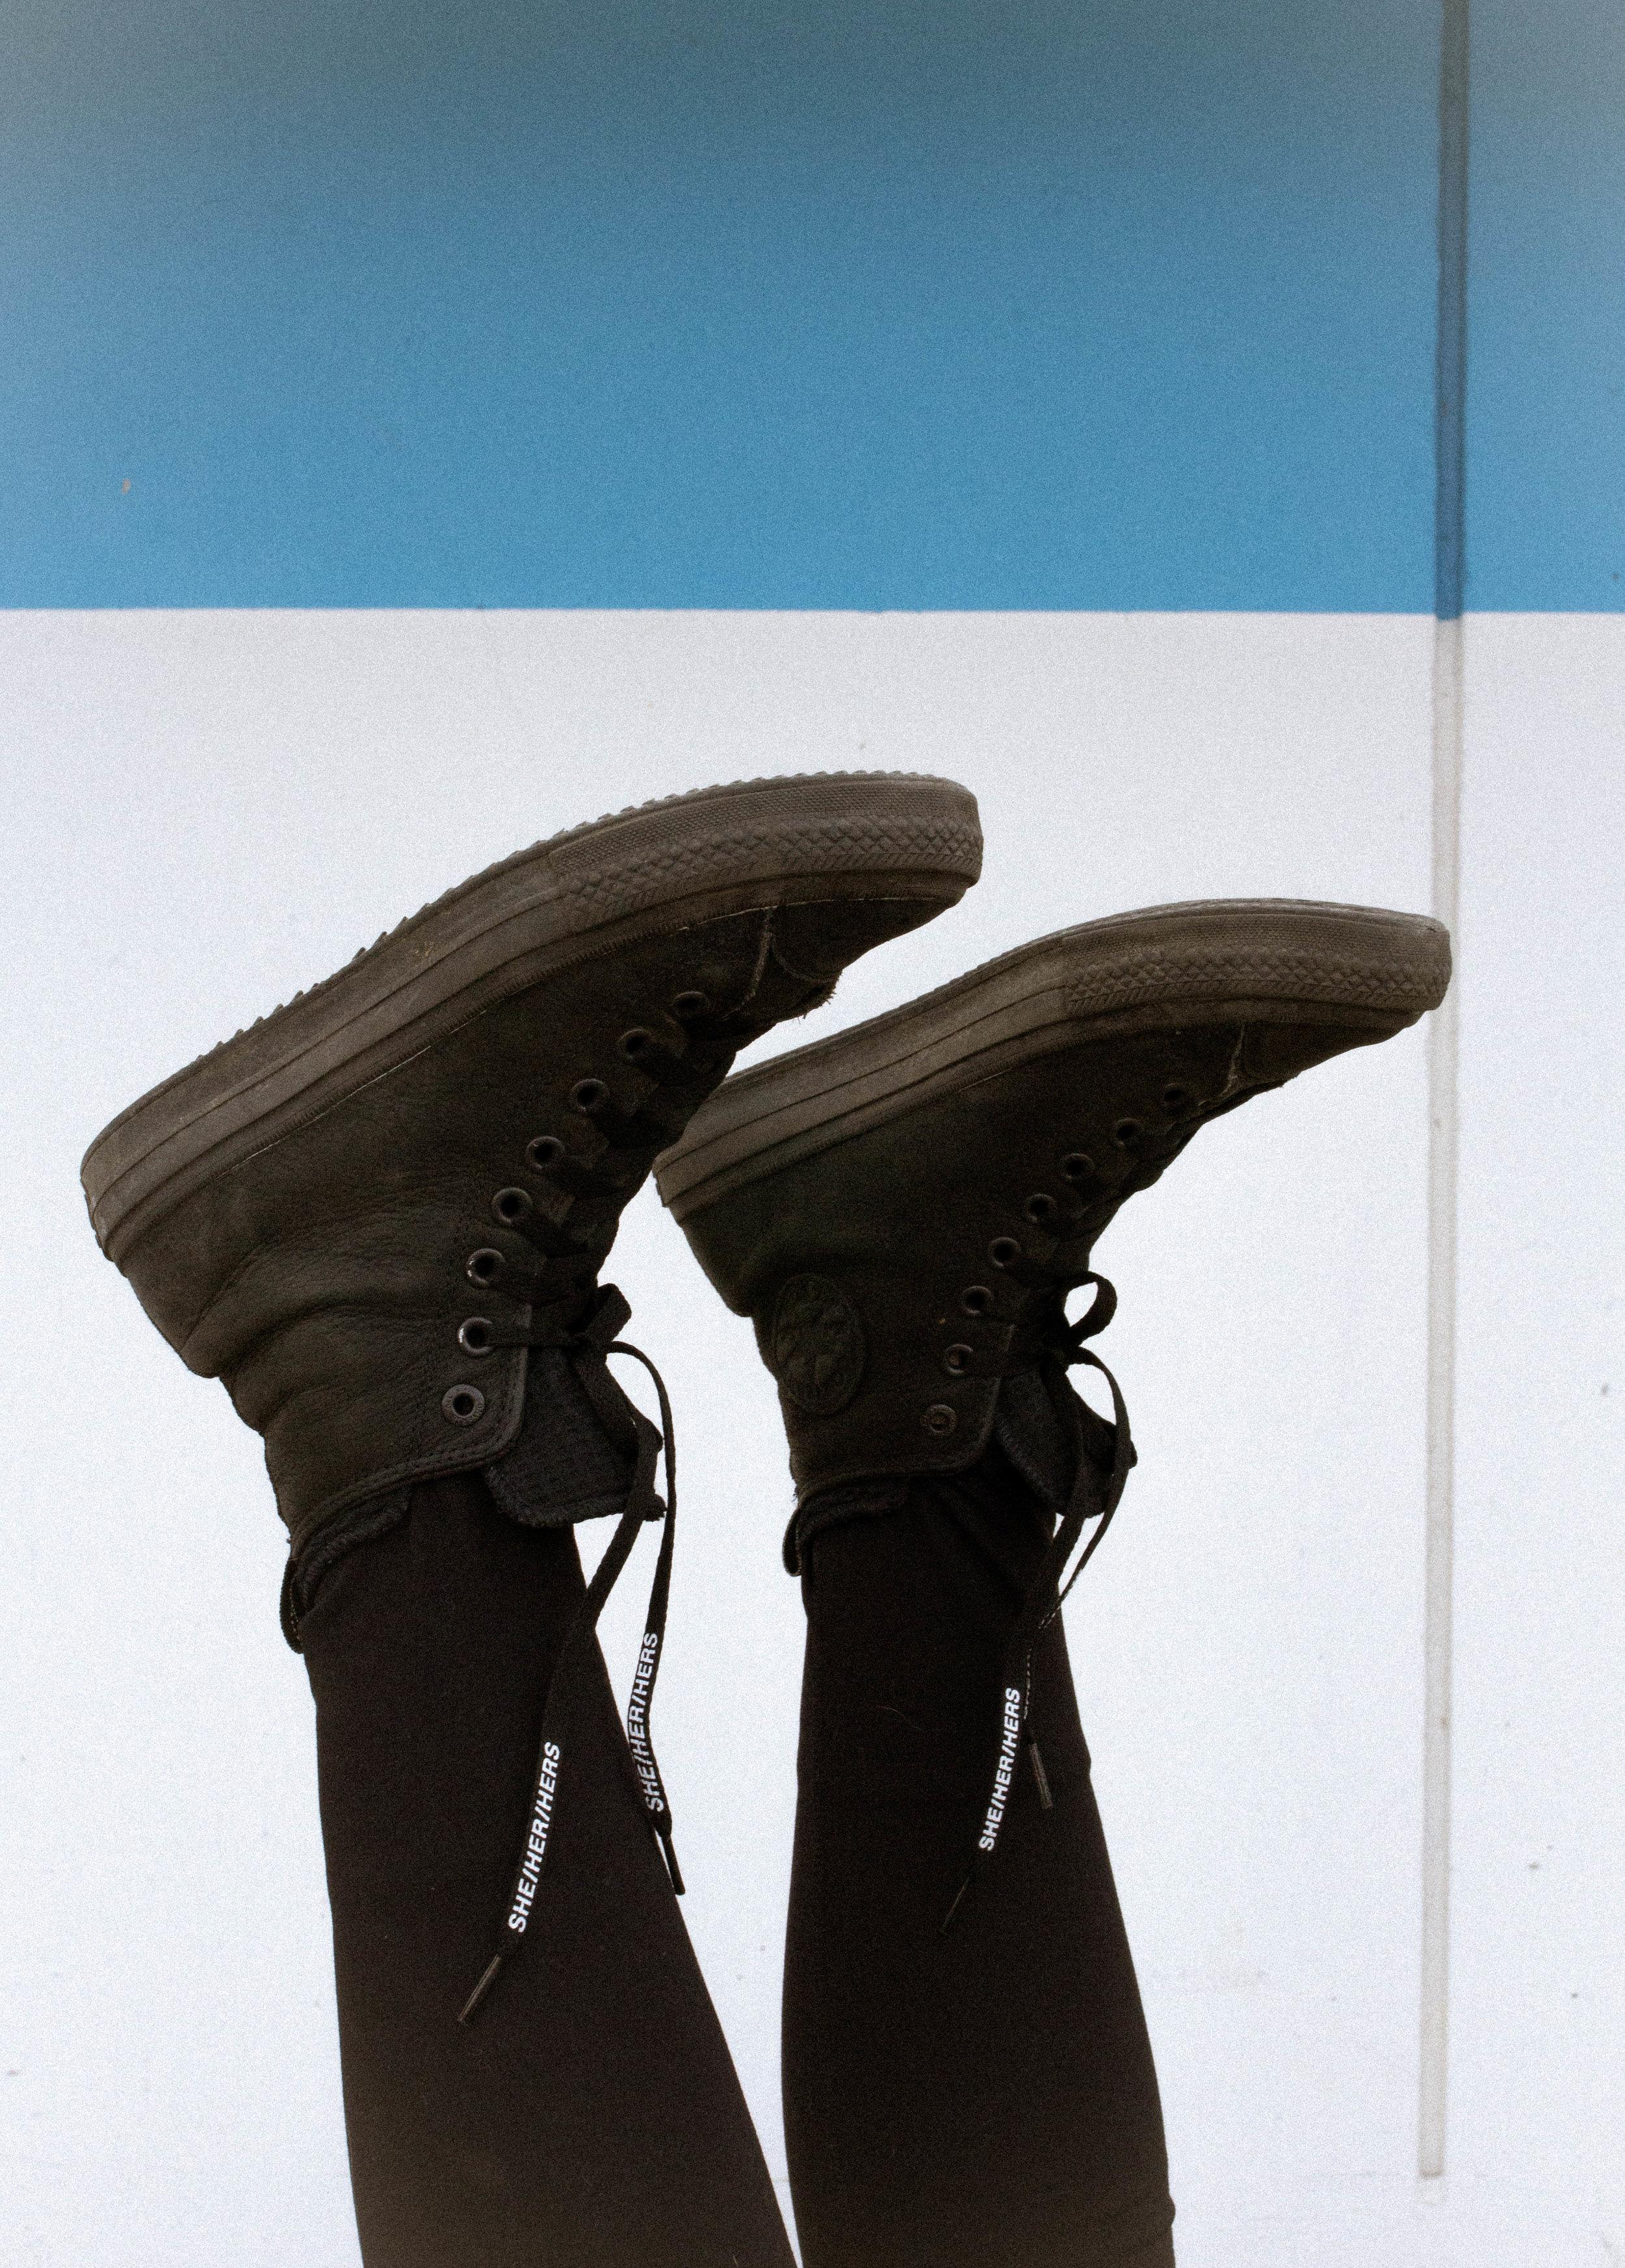 laces-28.jpg